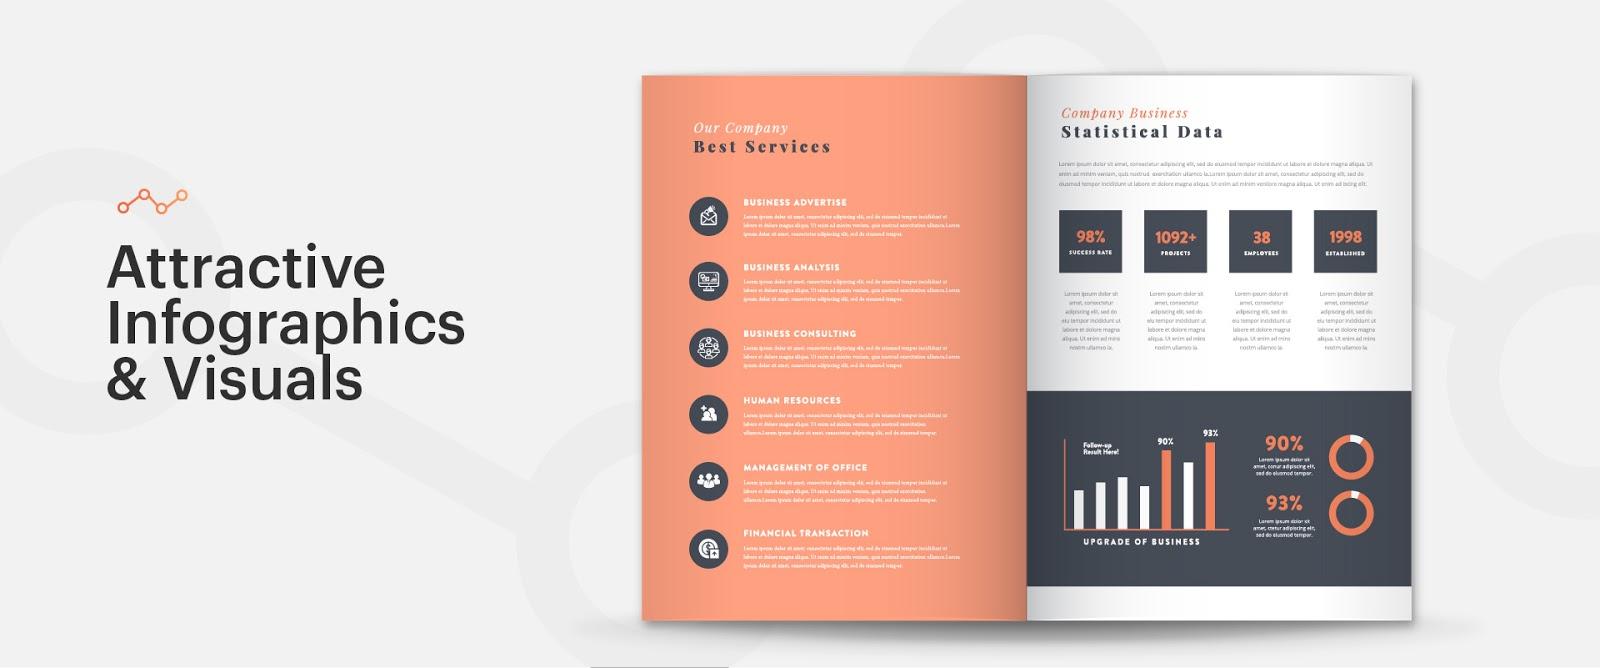 Attractive Infographics & Visuals